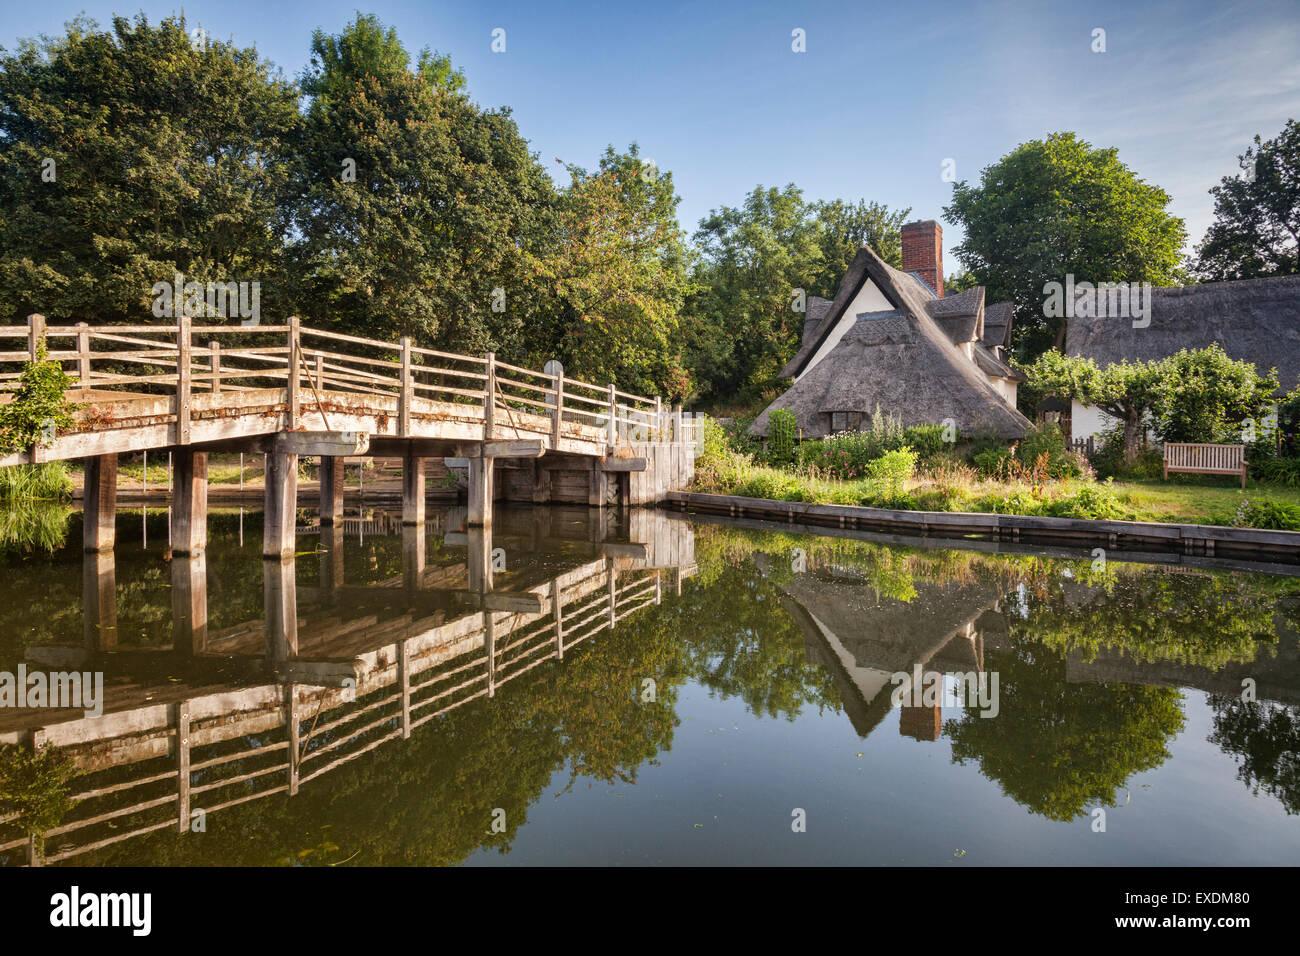 Flatford Bridge and Bridge Cottage on the River Stour in Dedham Vale, Suffolk, England. Stock Photo